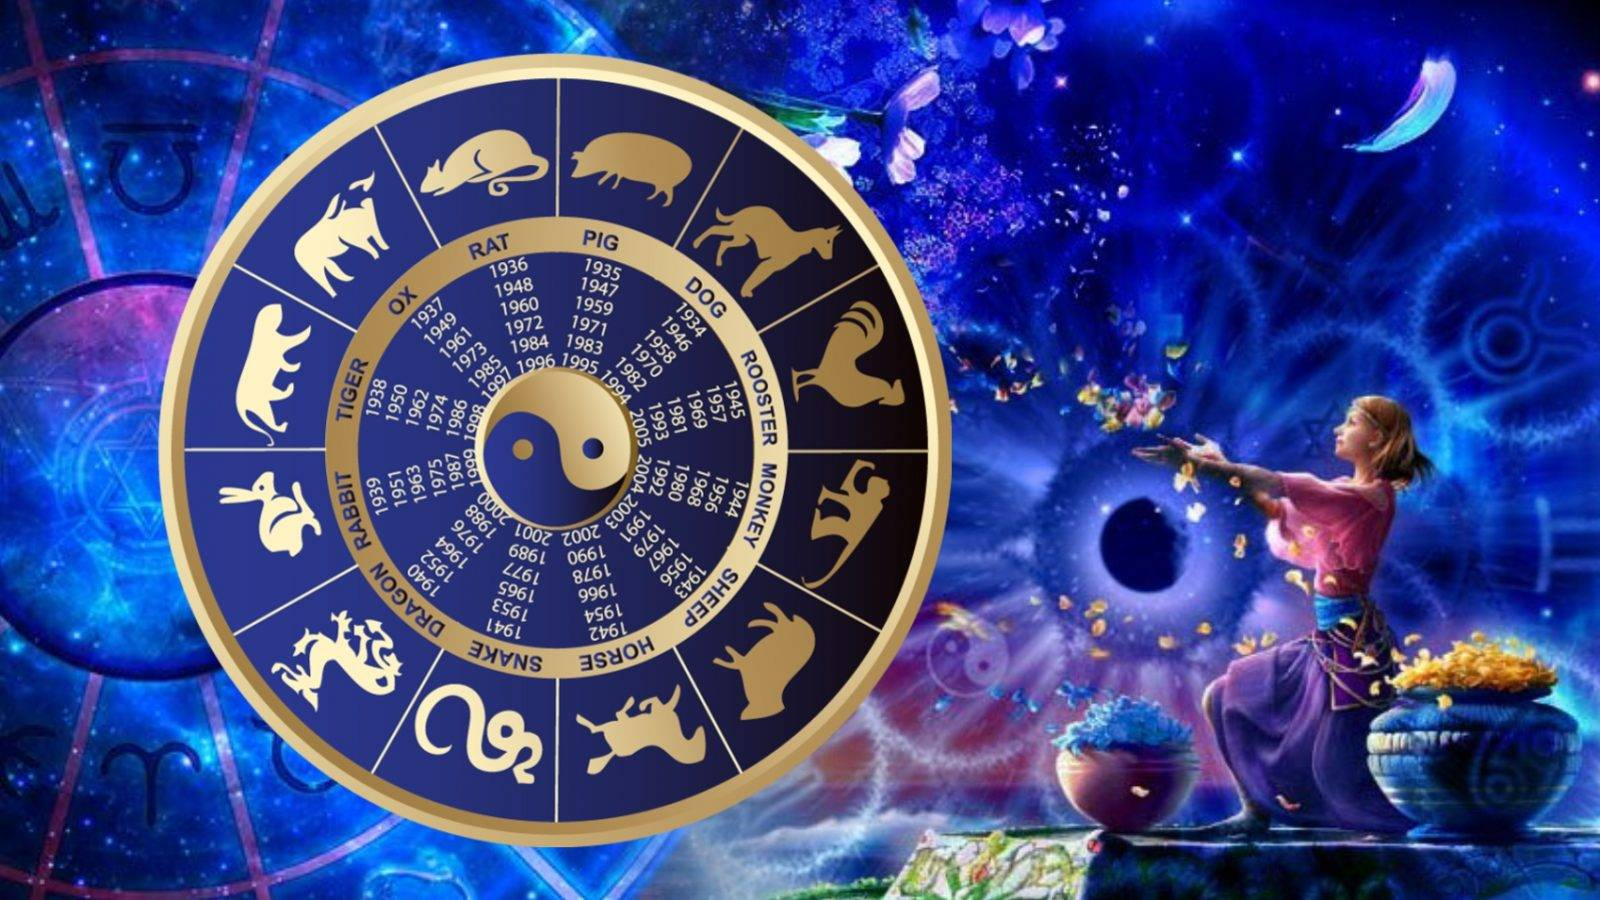 Год 2021: характеристика, гороскоп по знакам зодиака, прогноз